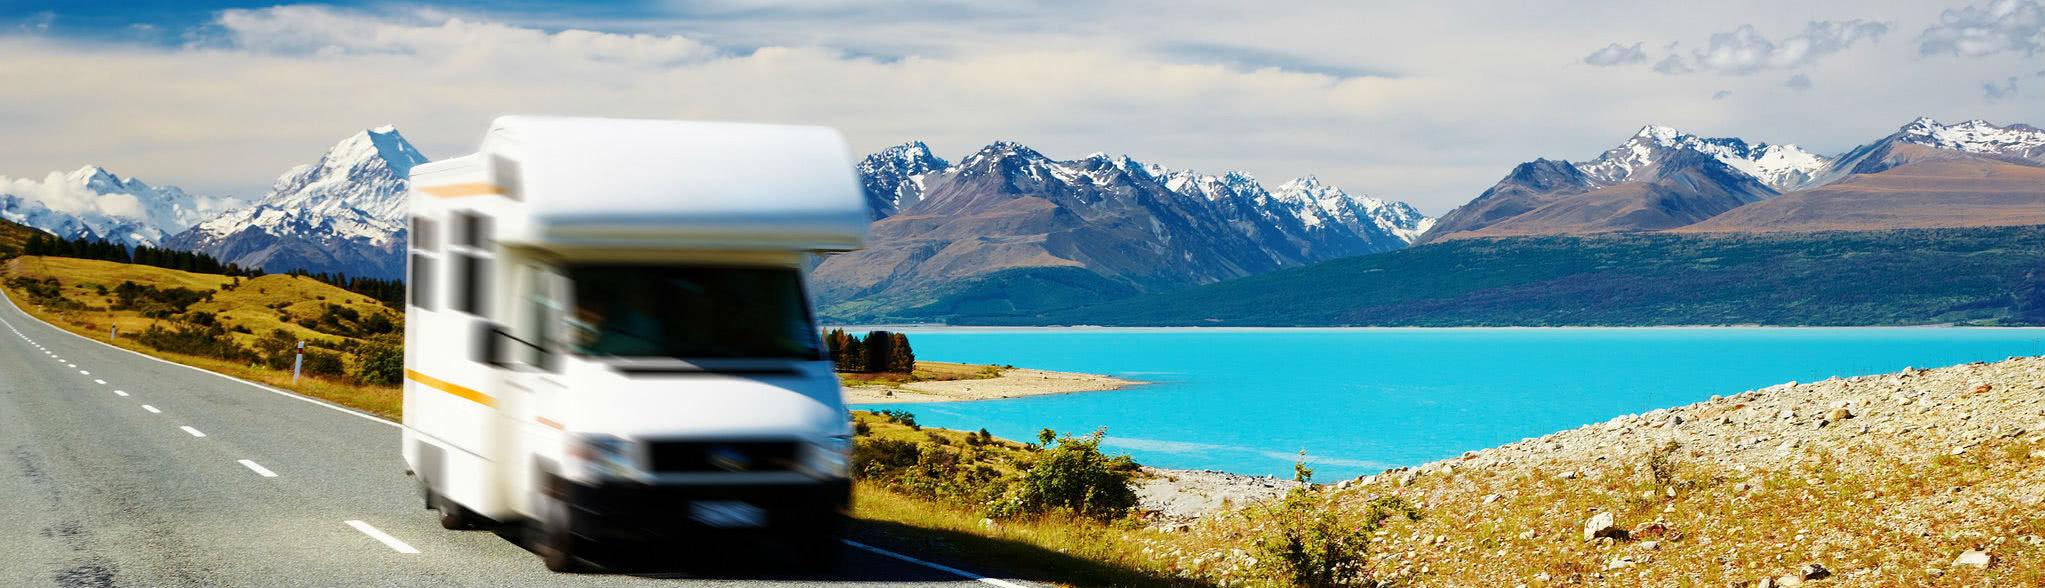 Rotorua guide